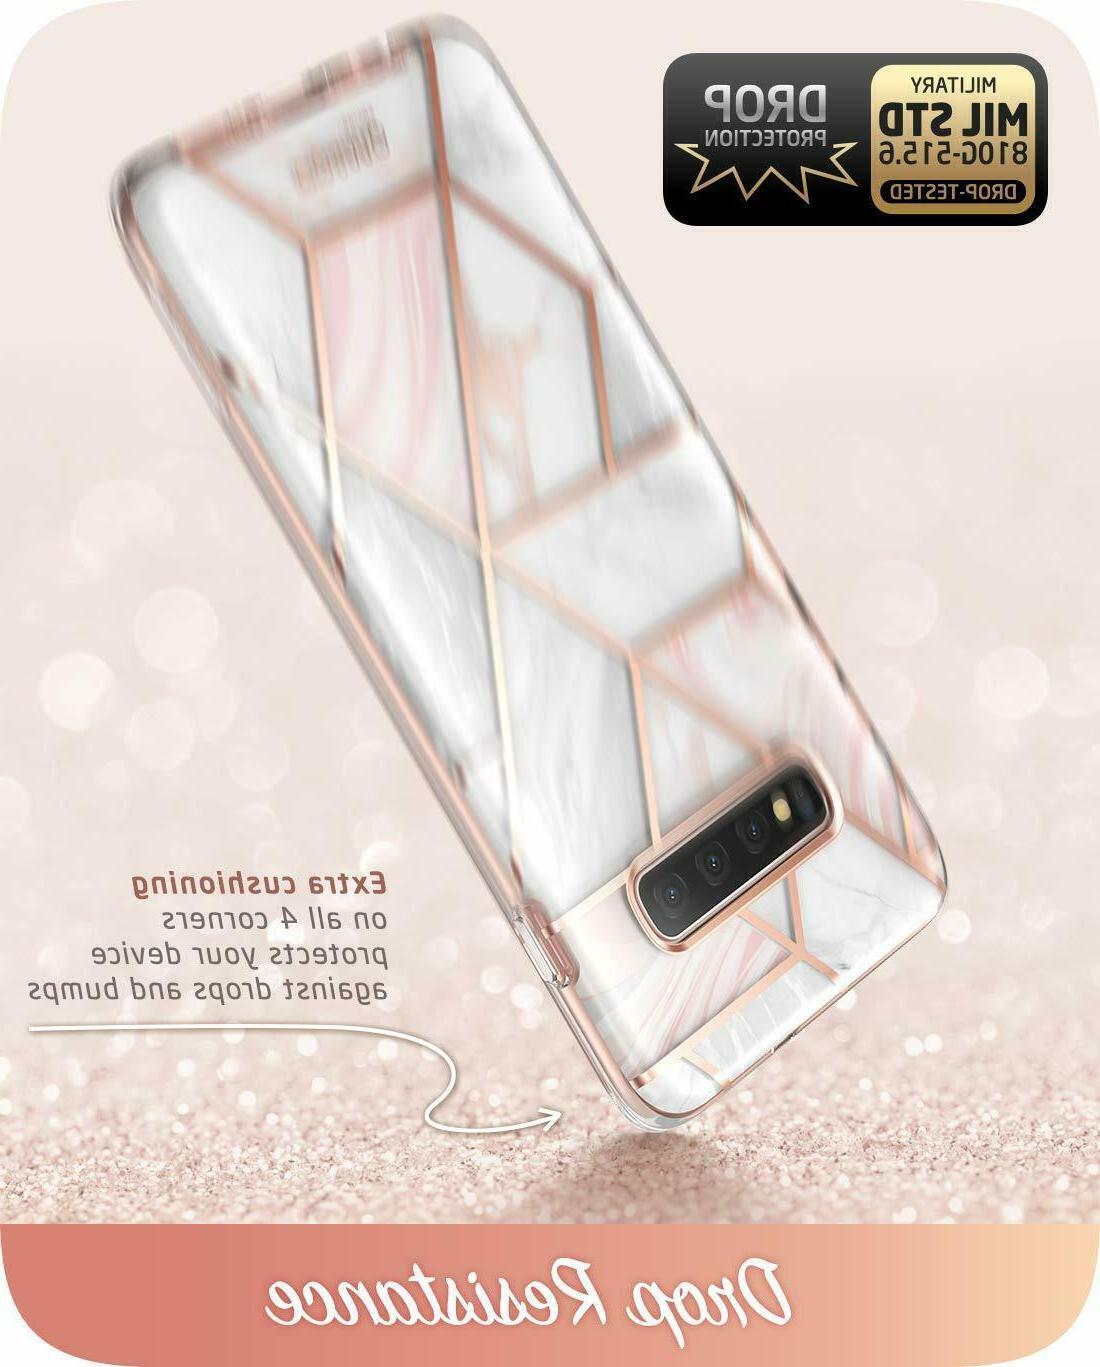 Samsung S10 Plus Case, Stylish Protective Shockproof